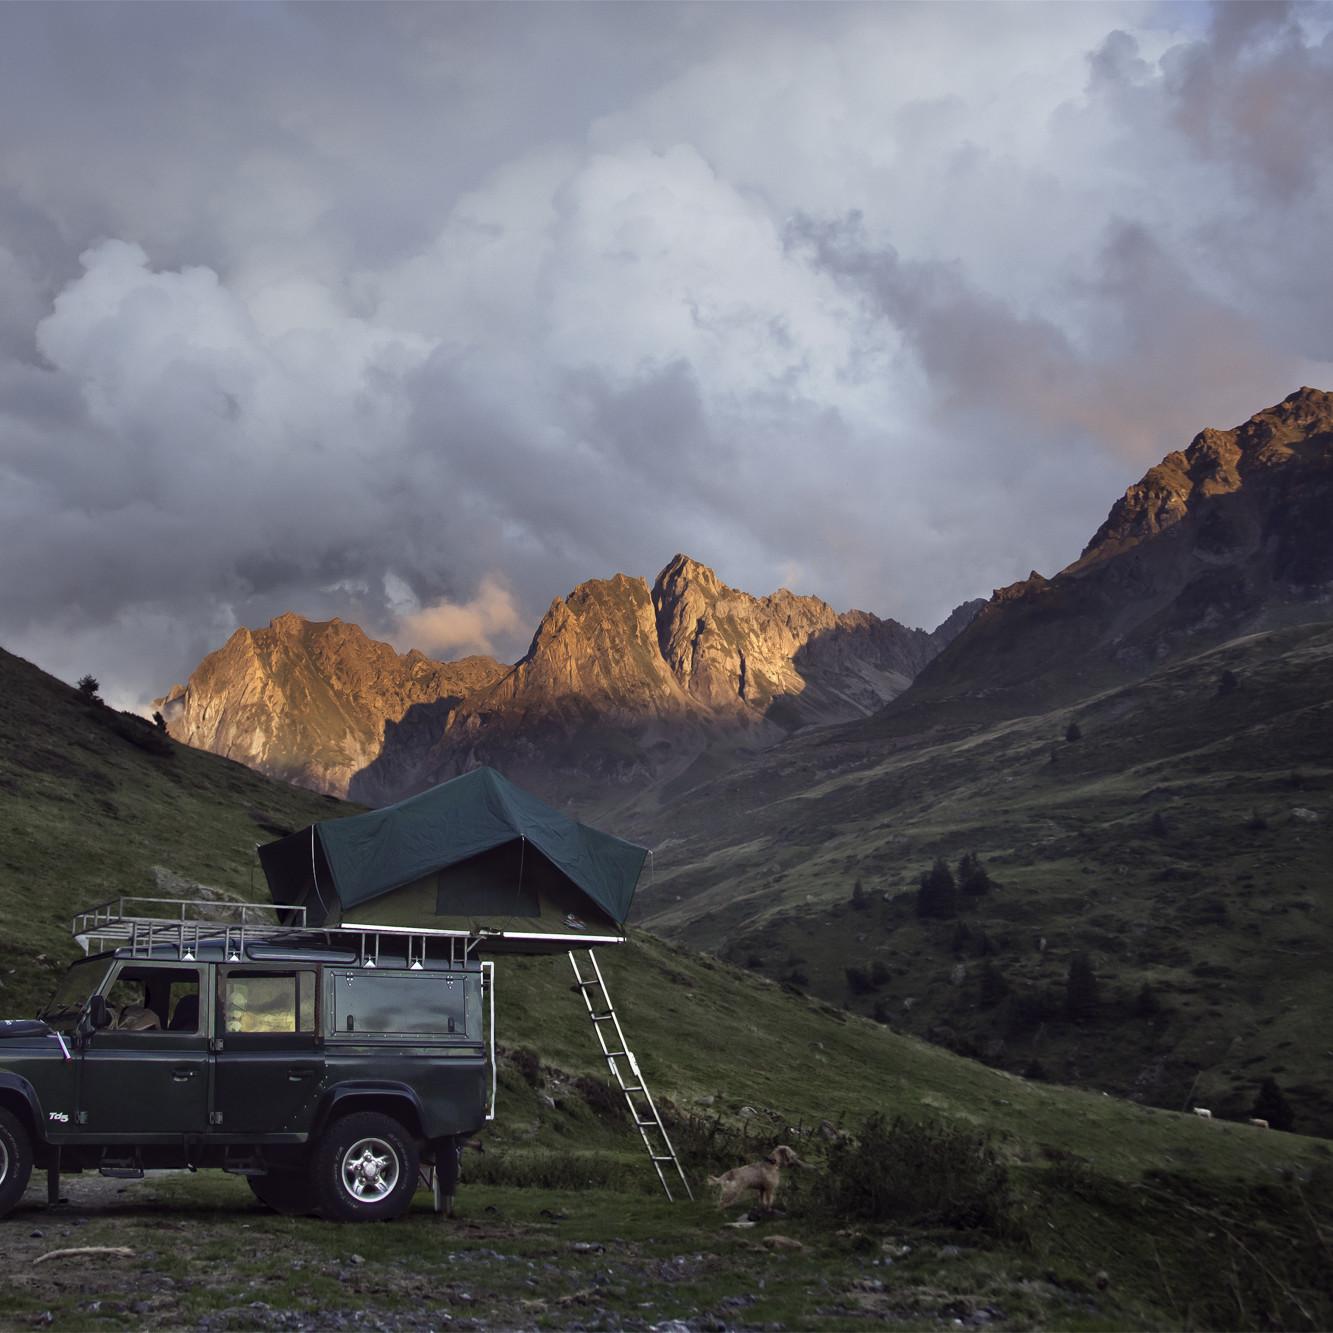 Chris Scott - Pyrenees Mount Score!